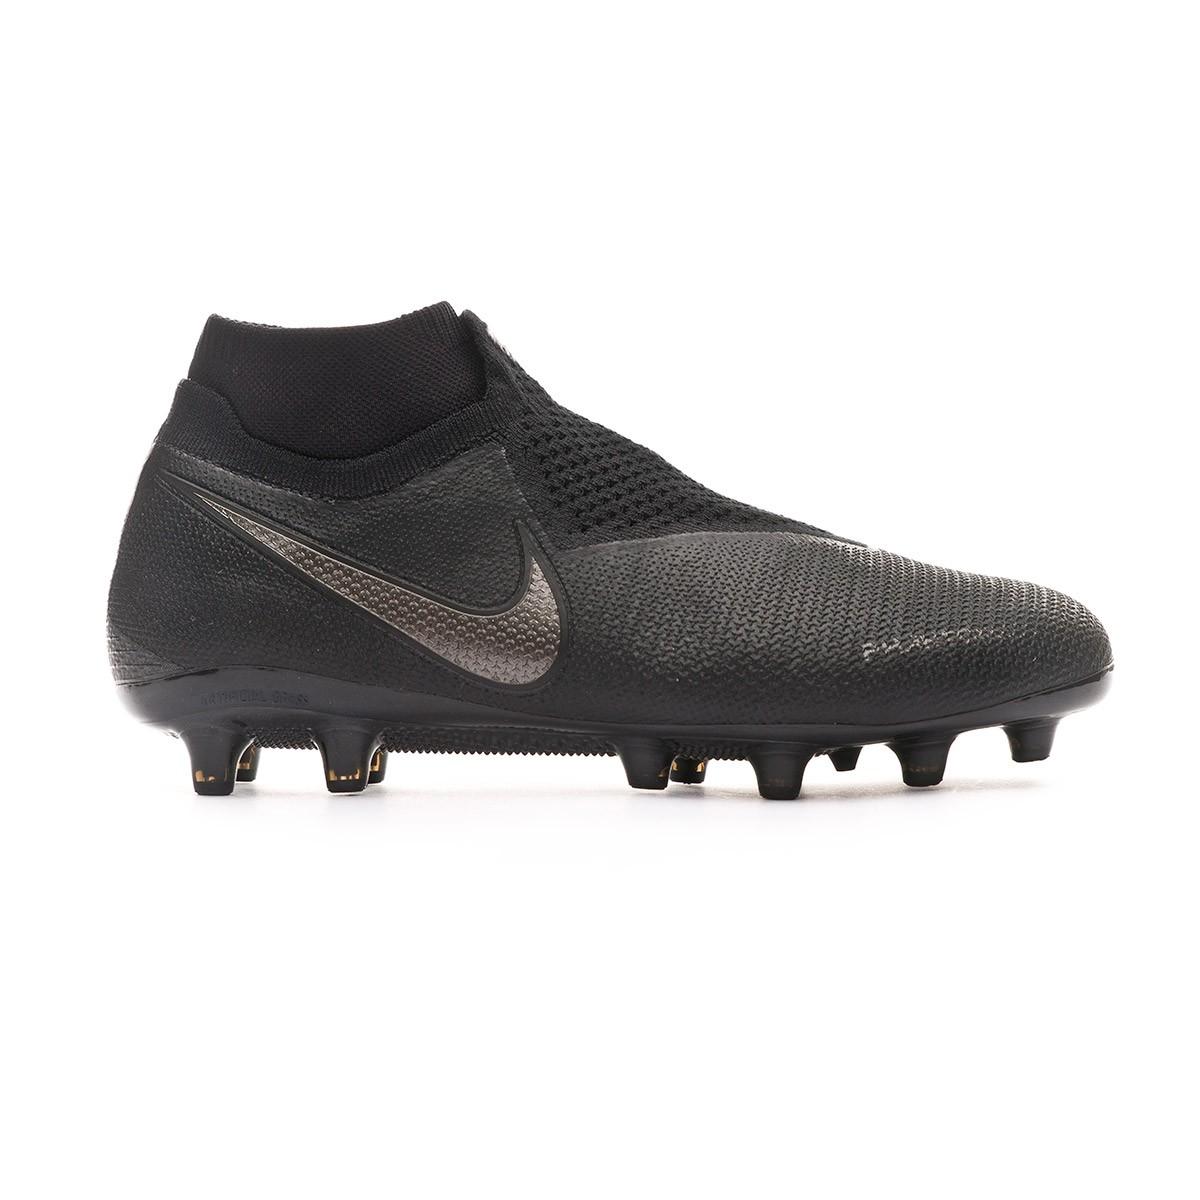 reputable site 198dc 7f177 Zapatos de fútbol Nike Phantom Vision Elite DF AG-Pro Black - Tienda de  fútbol Fútbol Emotion